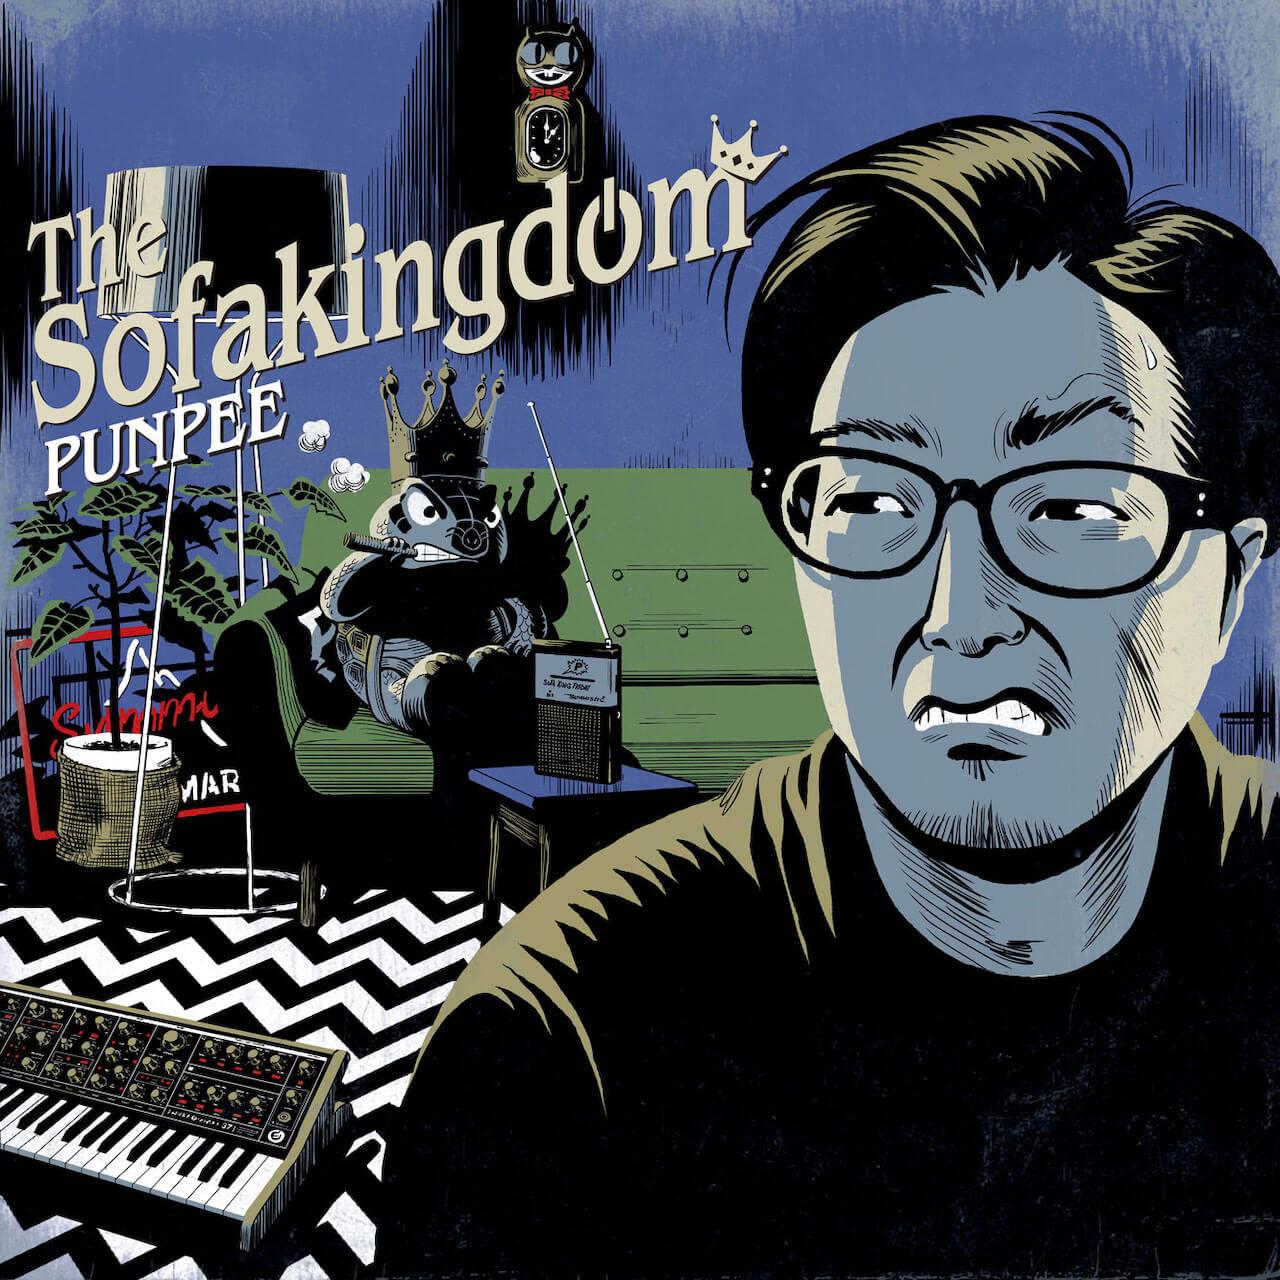 PUNPEEが5曲入りのEP『The Sofakingdom』をリリース|KREVA客演「夢追人」MVが公開 music200630-punpee-3